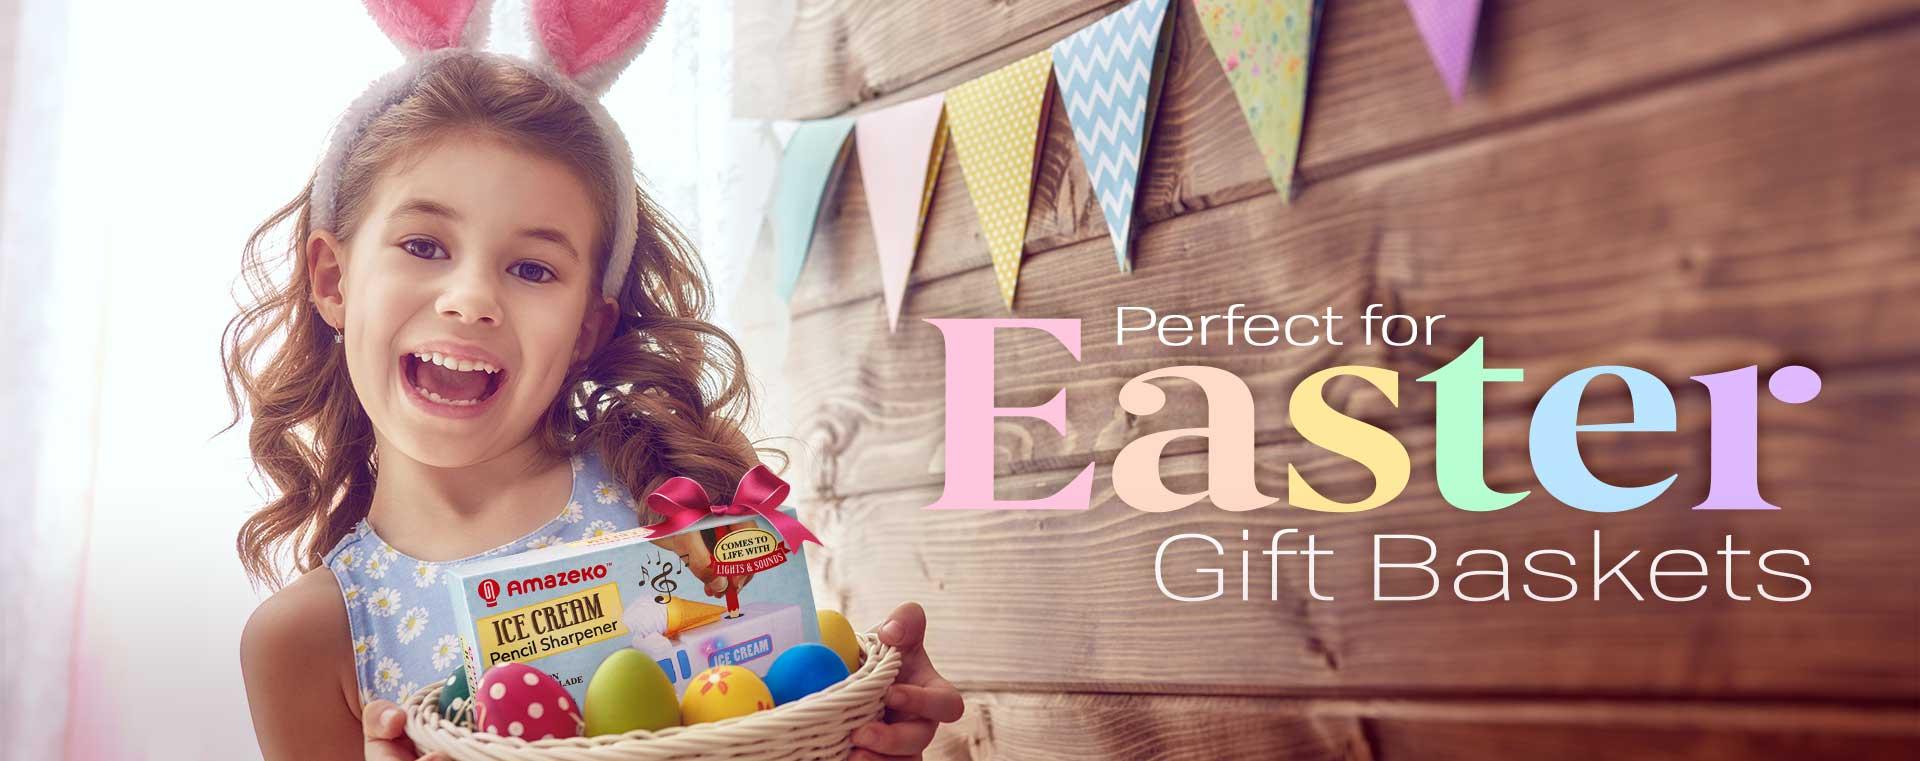 Girl with easter basket containing Amazeko pencil sharpener